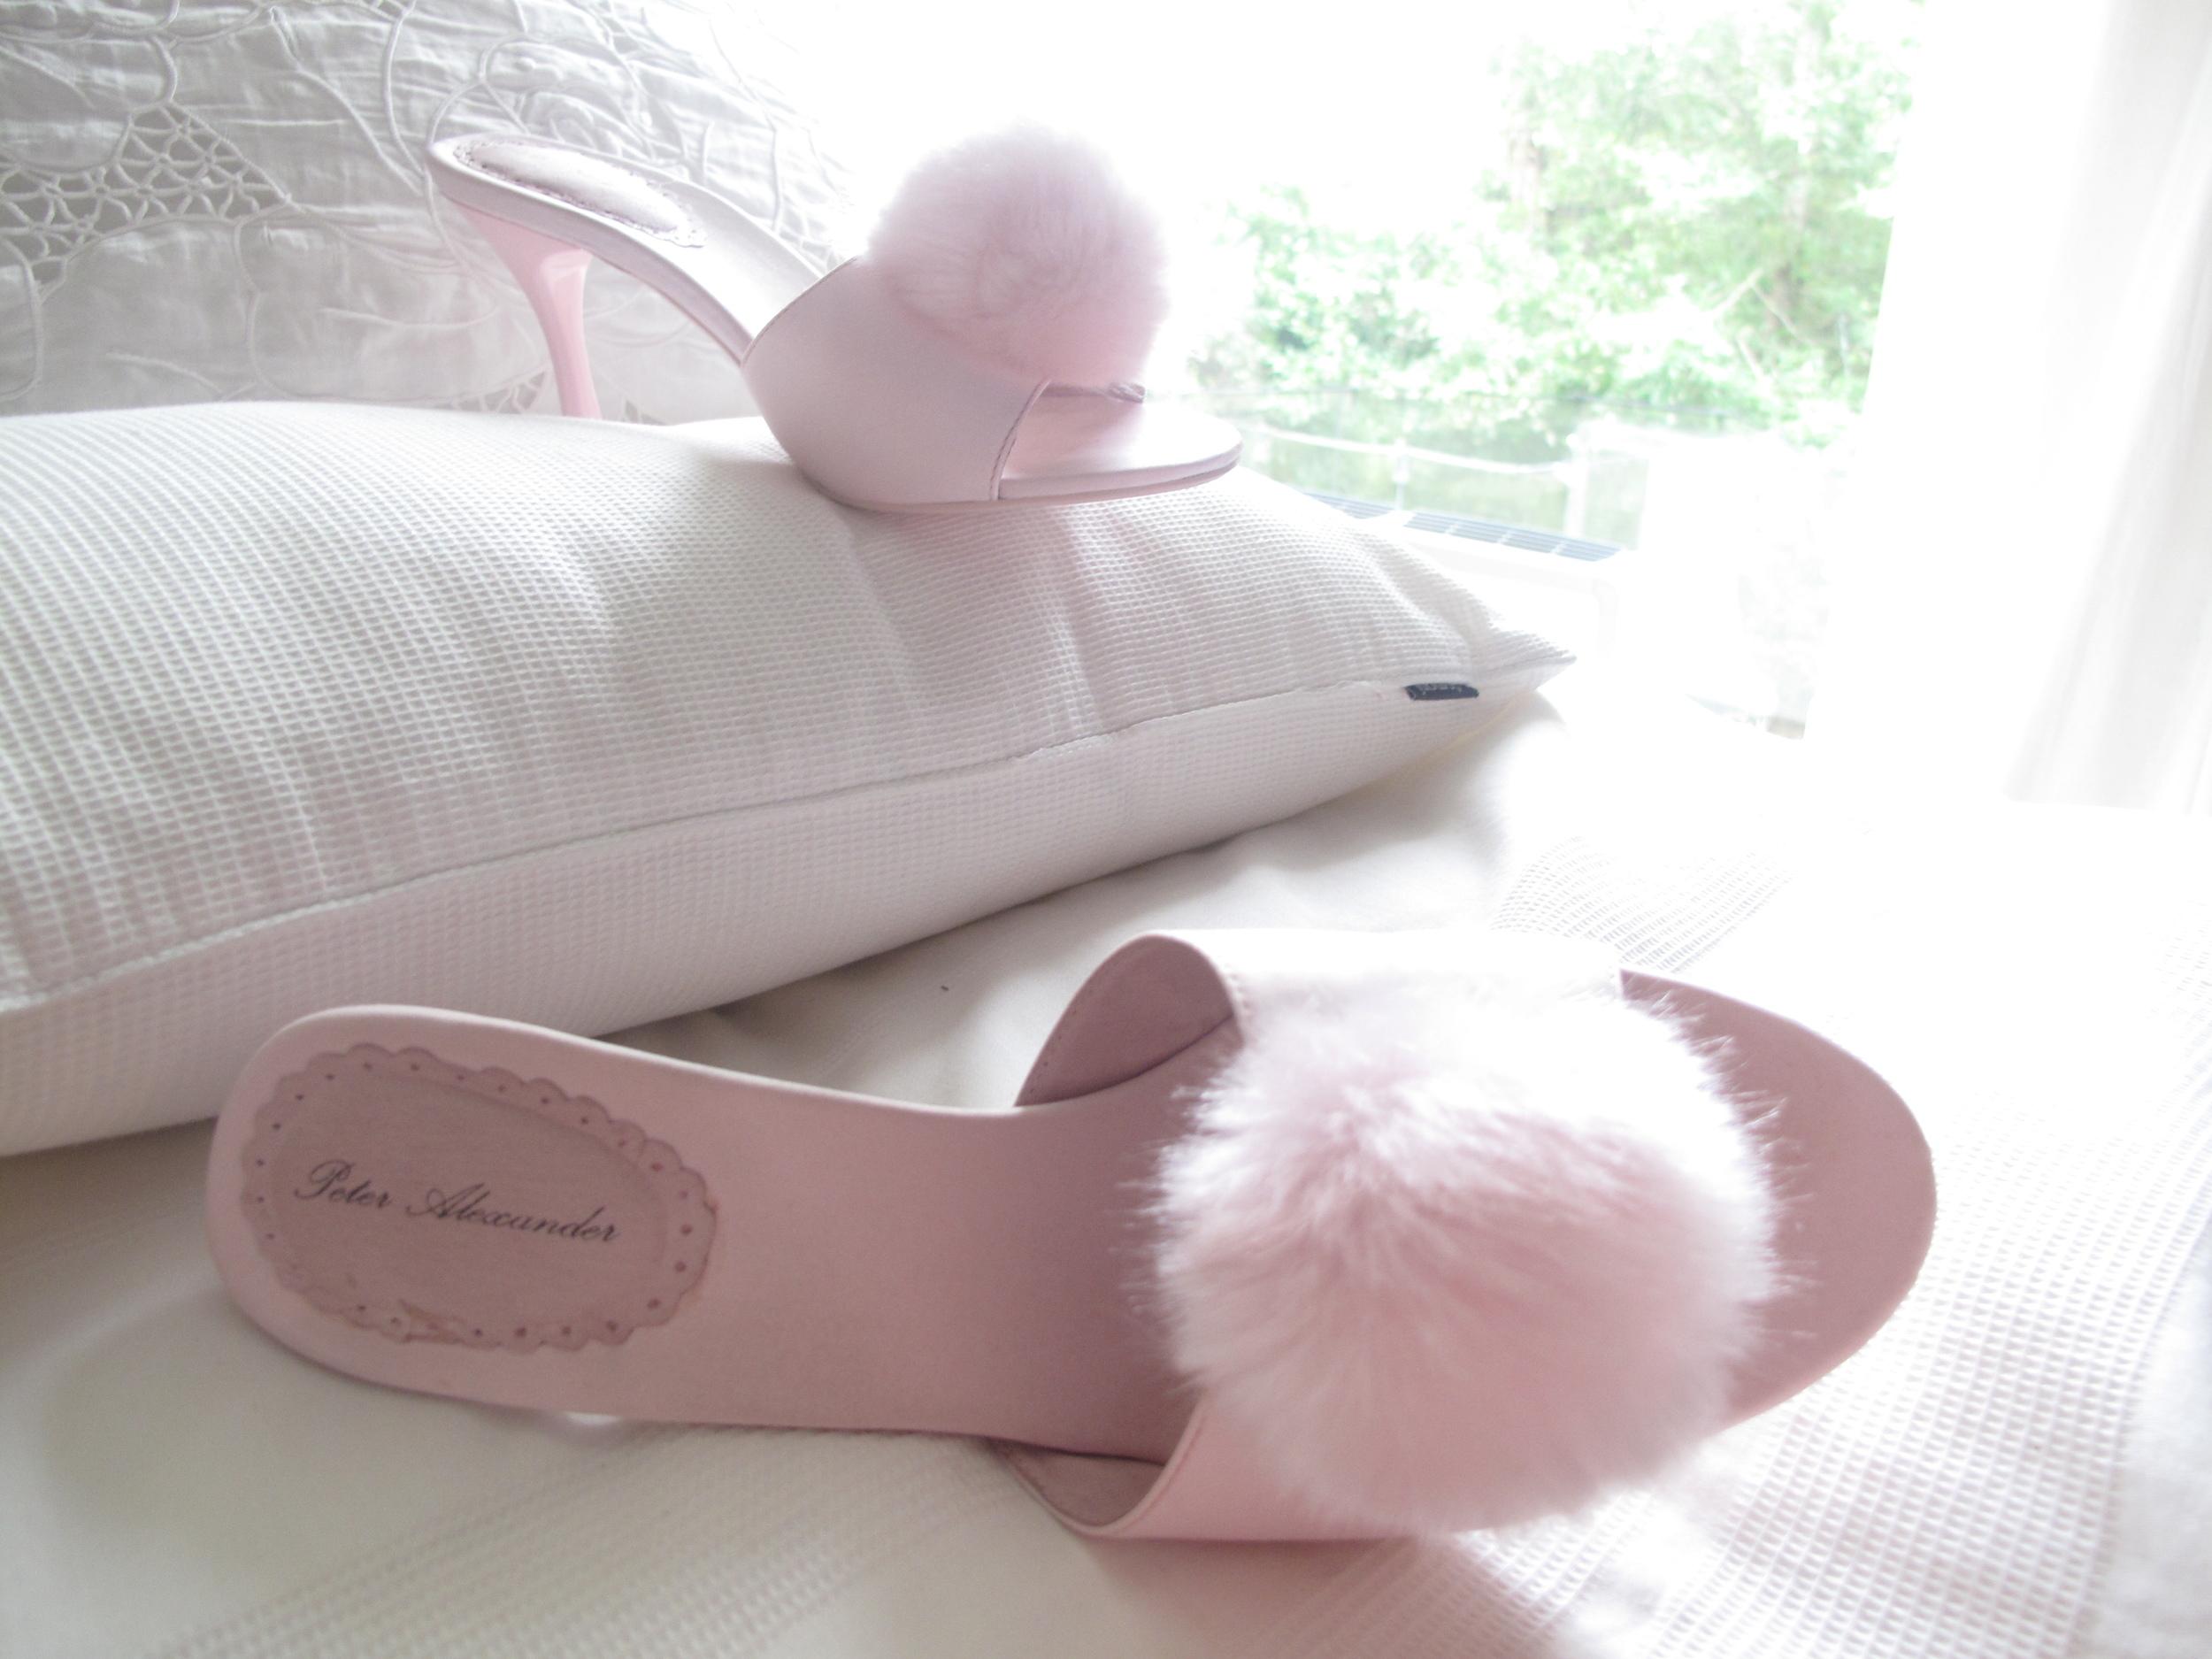 Marilyn Monroe marabou slippers